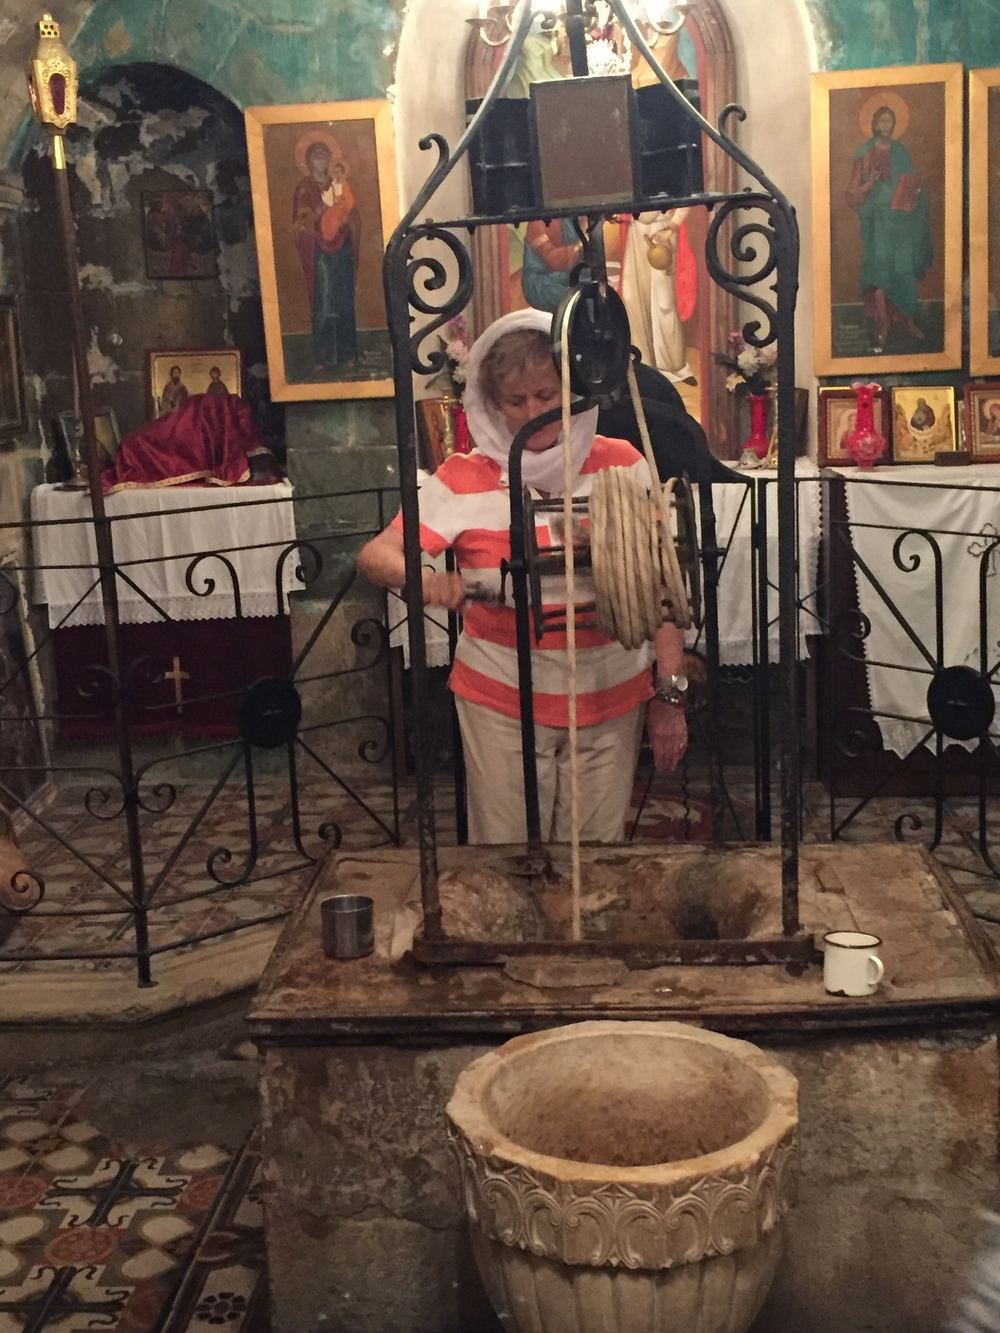 Day 6: Nazareth Sunrise, Jordan River, Mount of Beatitudes, Sea of Galilea, Loaves & Fishes Church, Jacob's Well